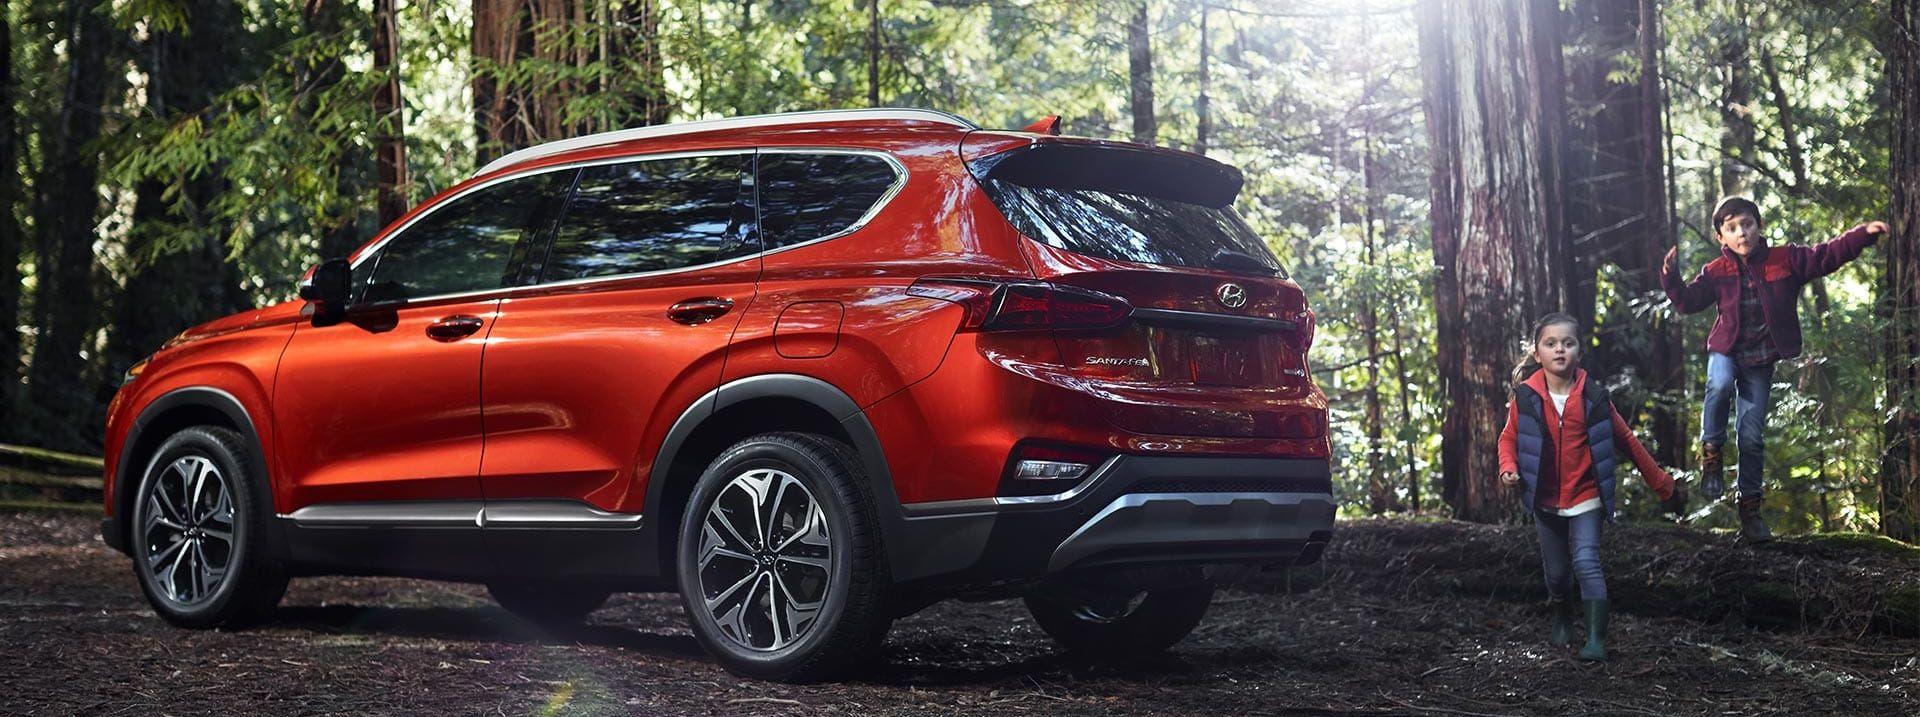 2019 Hyundai Santa Fe Leasing near Manassas, VA